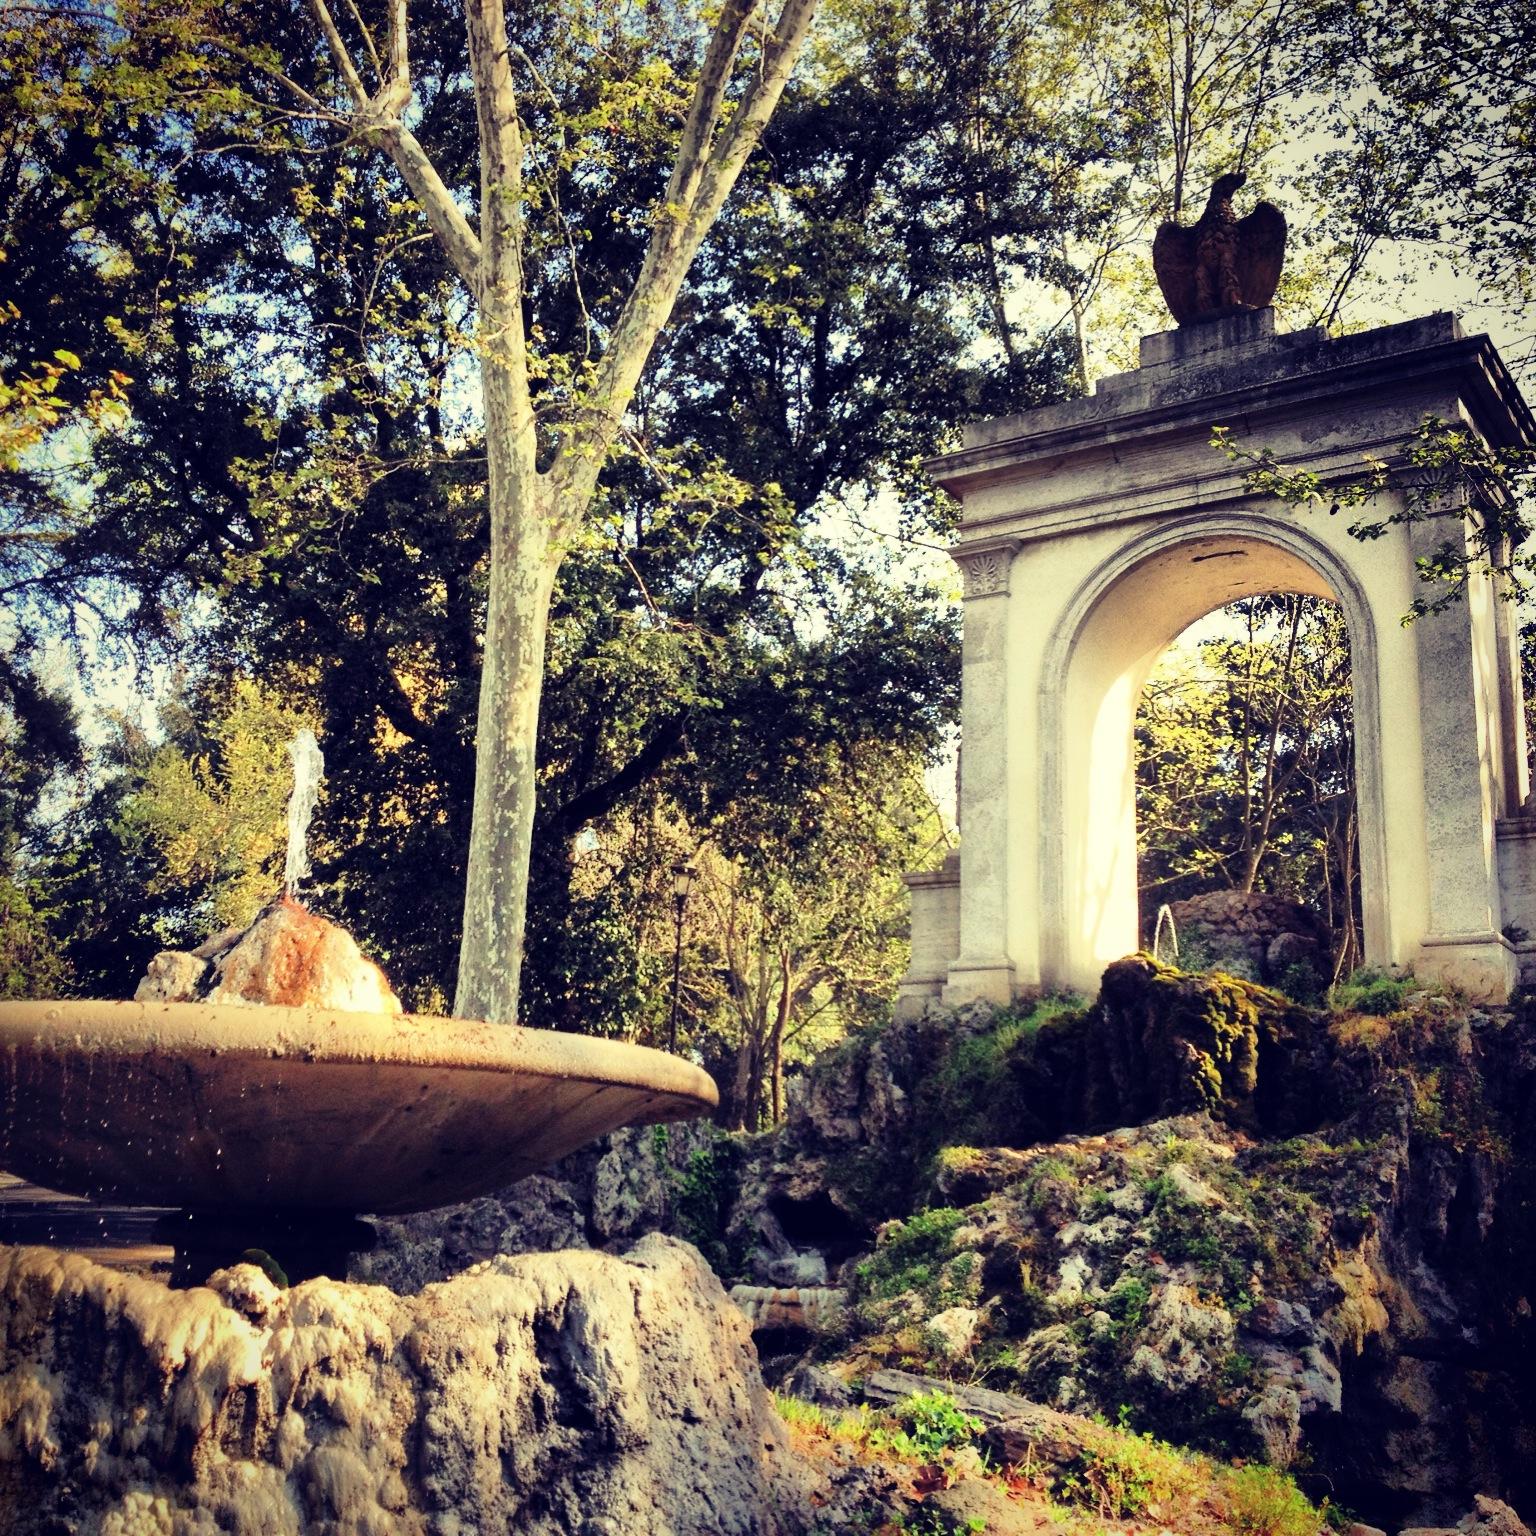 Villa Borghese - Fountains of Rome